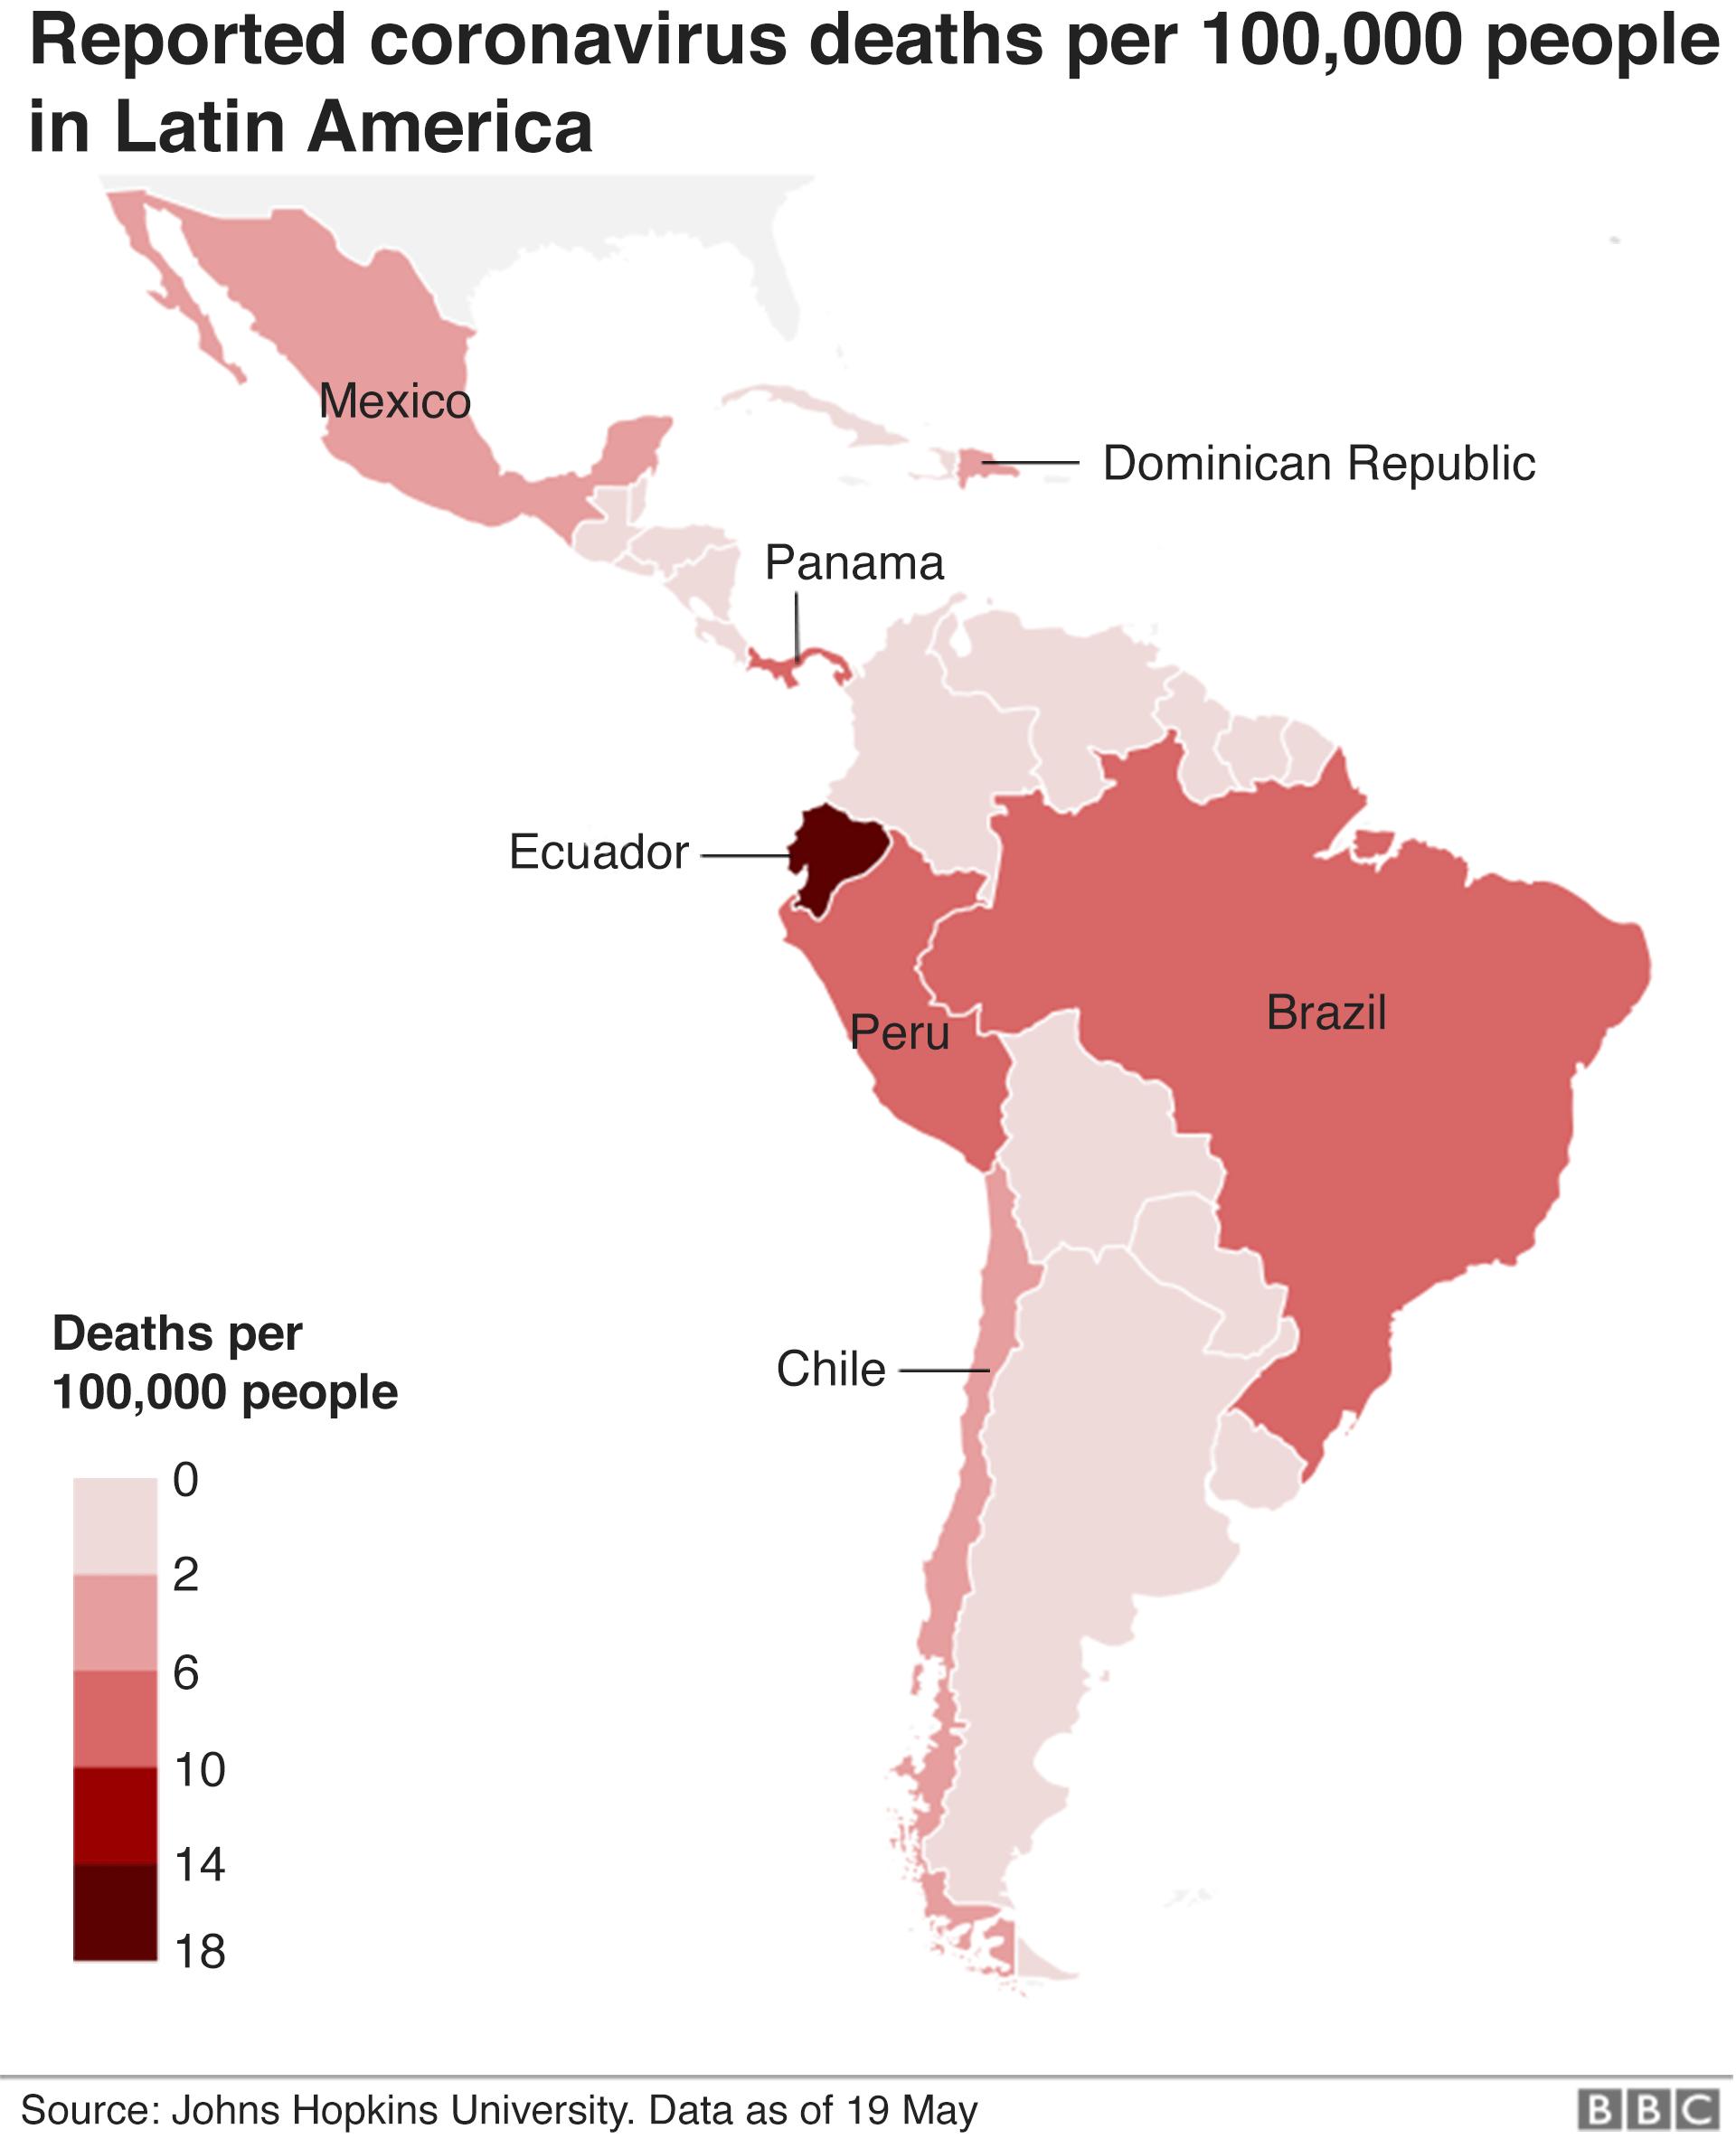 Reported coronavirus deaths per 100,000 people in Latin America